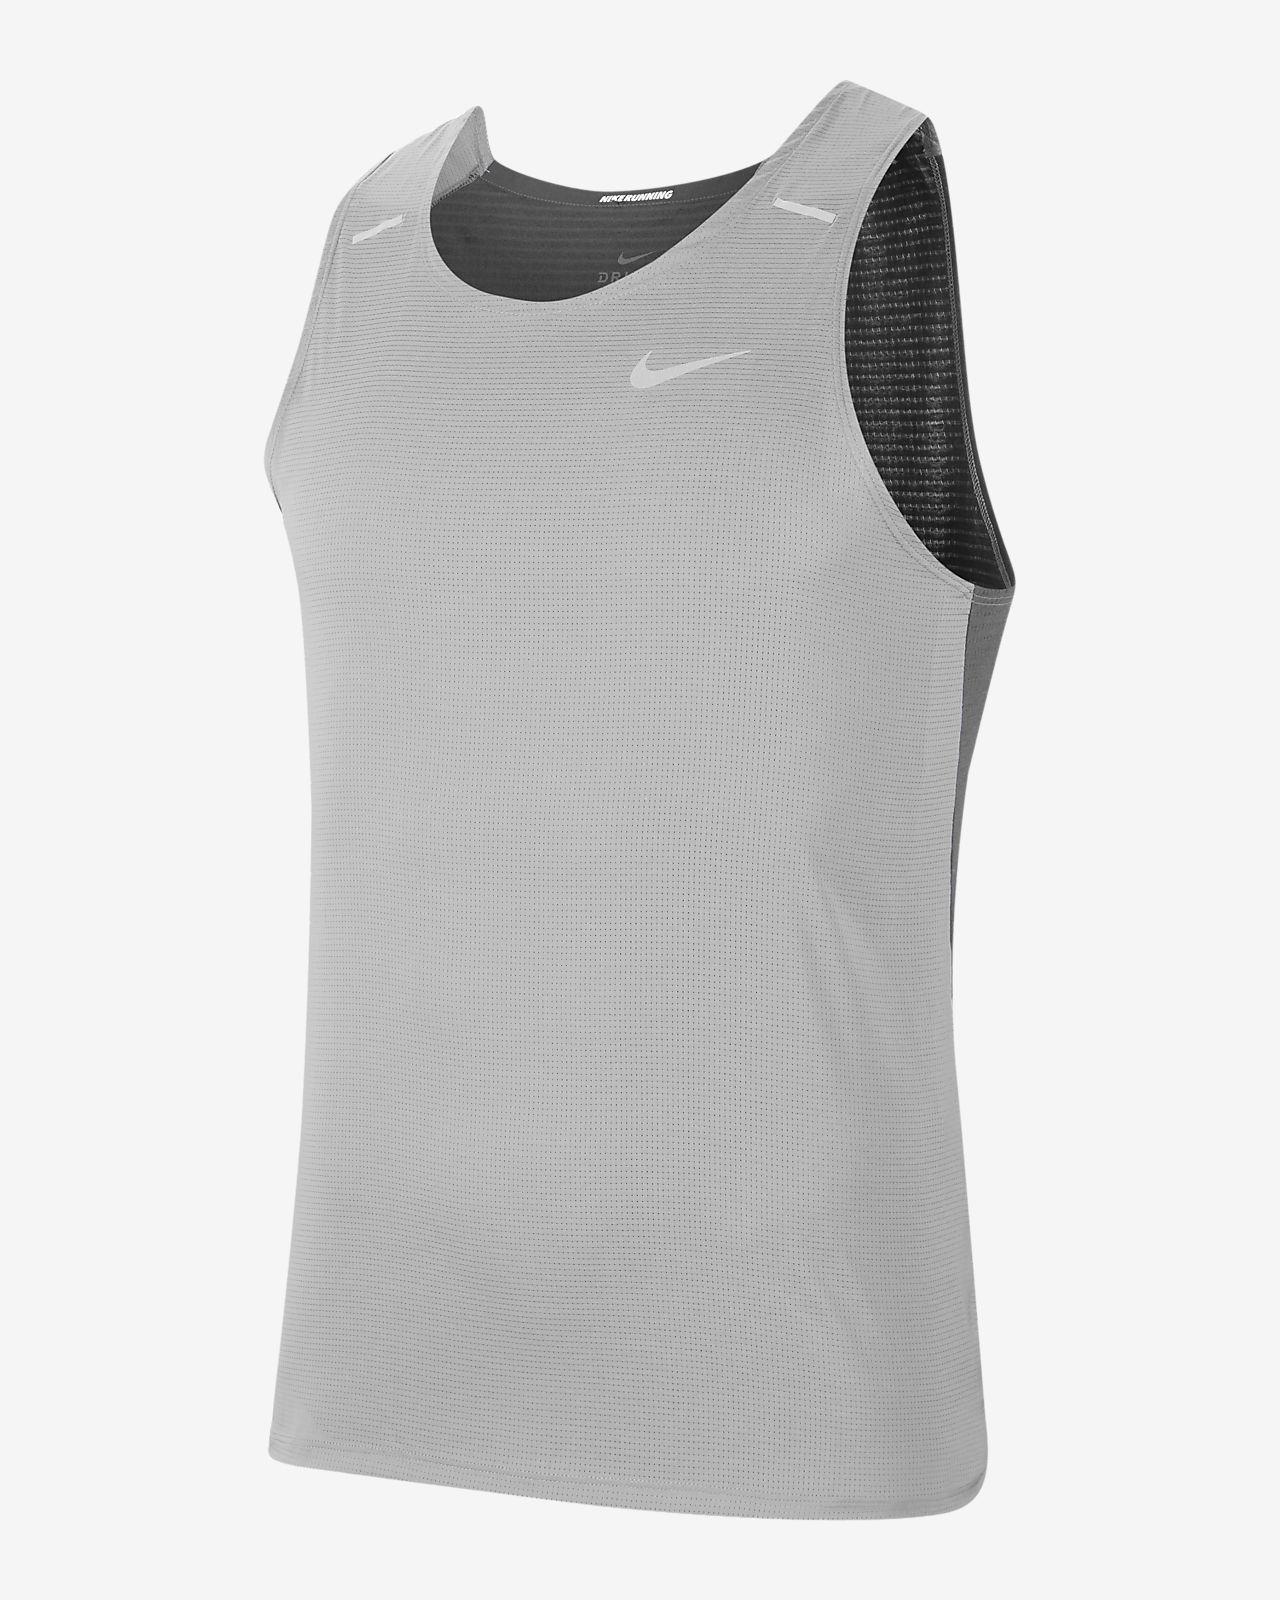 Canotta da running Hybrid Nike Breathe Rise 365 Uomo